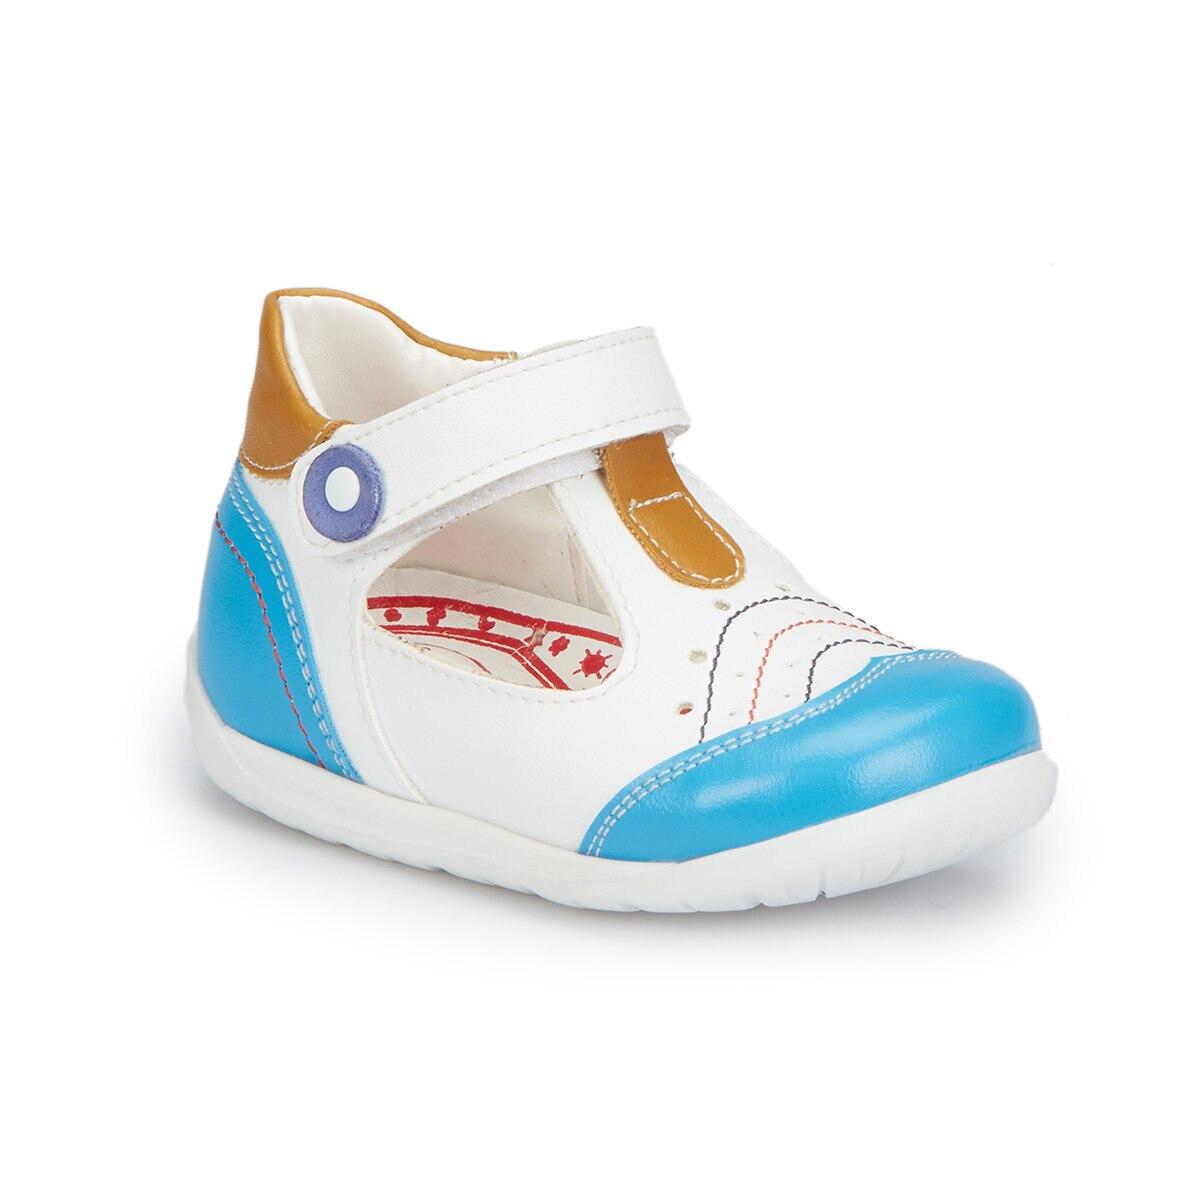 FLO 81.510048.I Blue Male Child Sneaker Shoes Polaris Sneakers     - title=